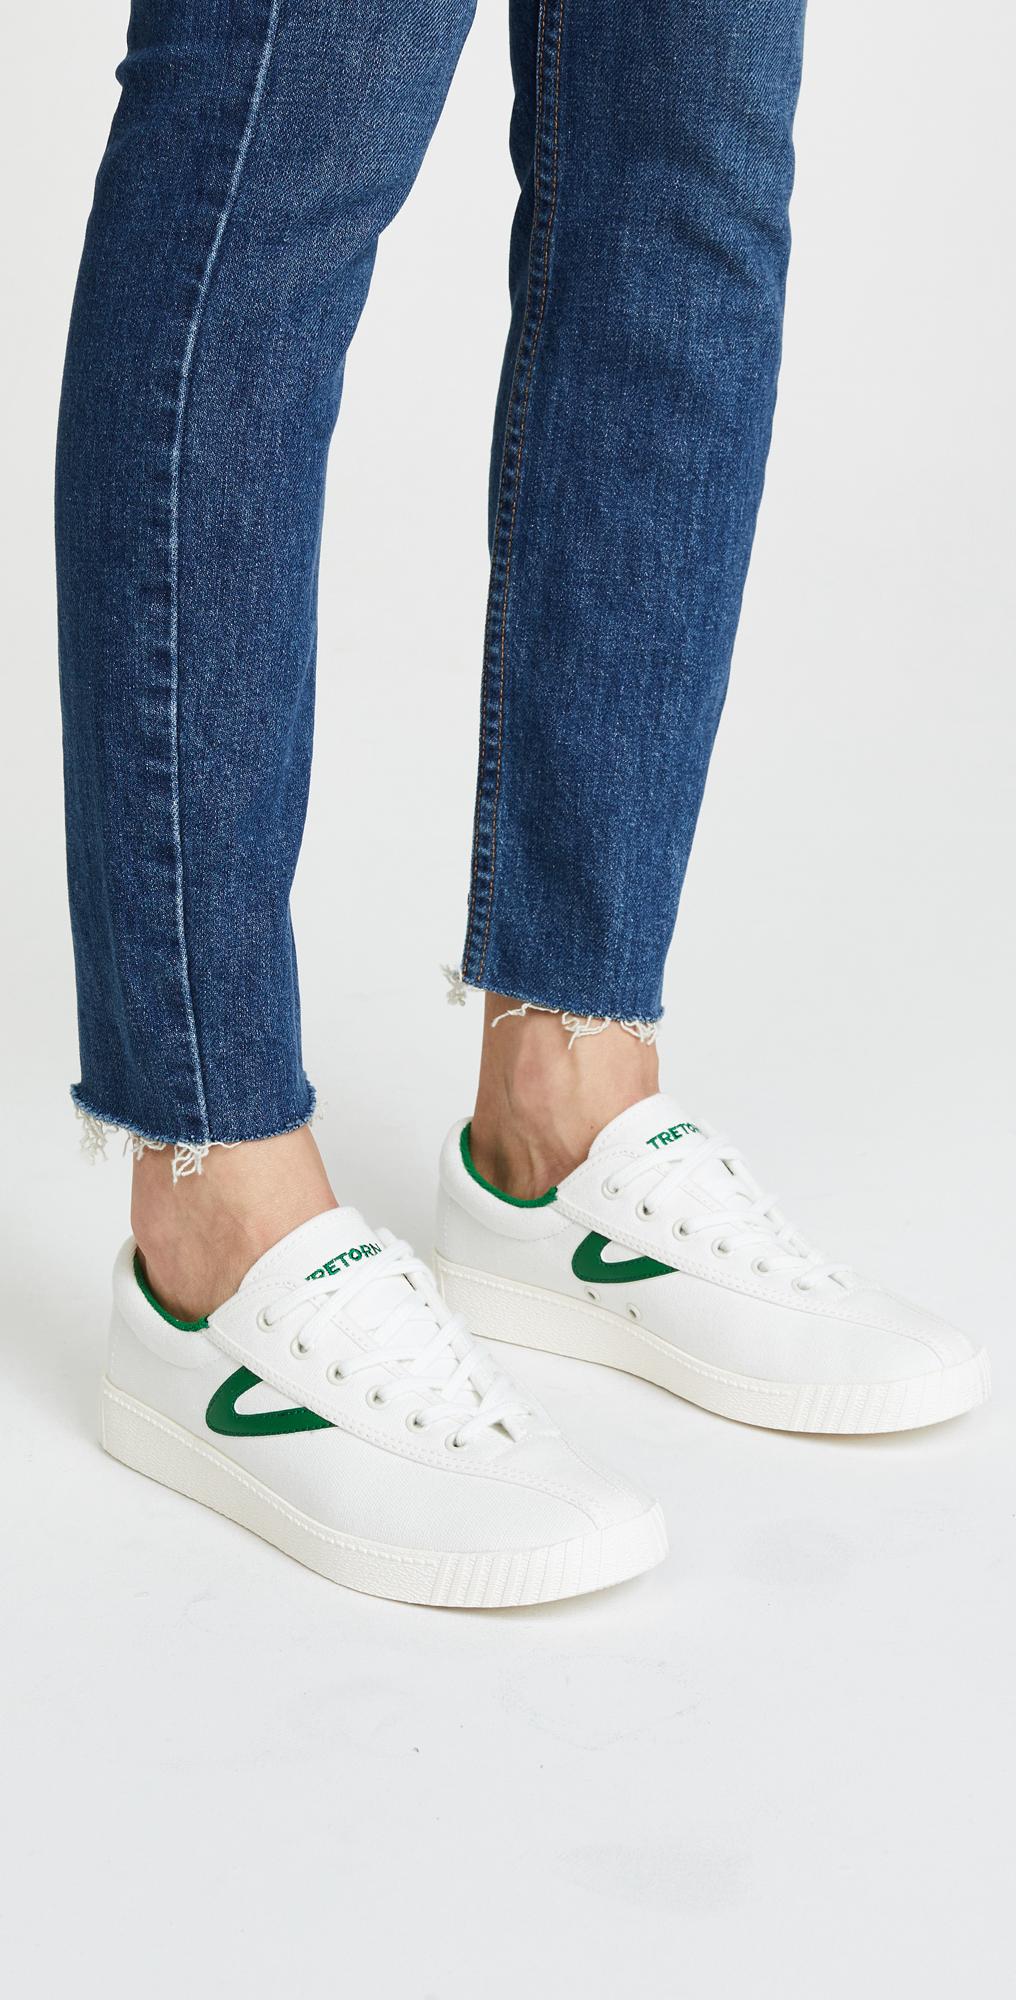 Tretorn Nylite Sneakers   SHOPBOP